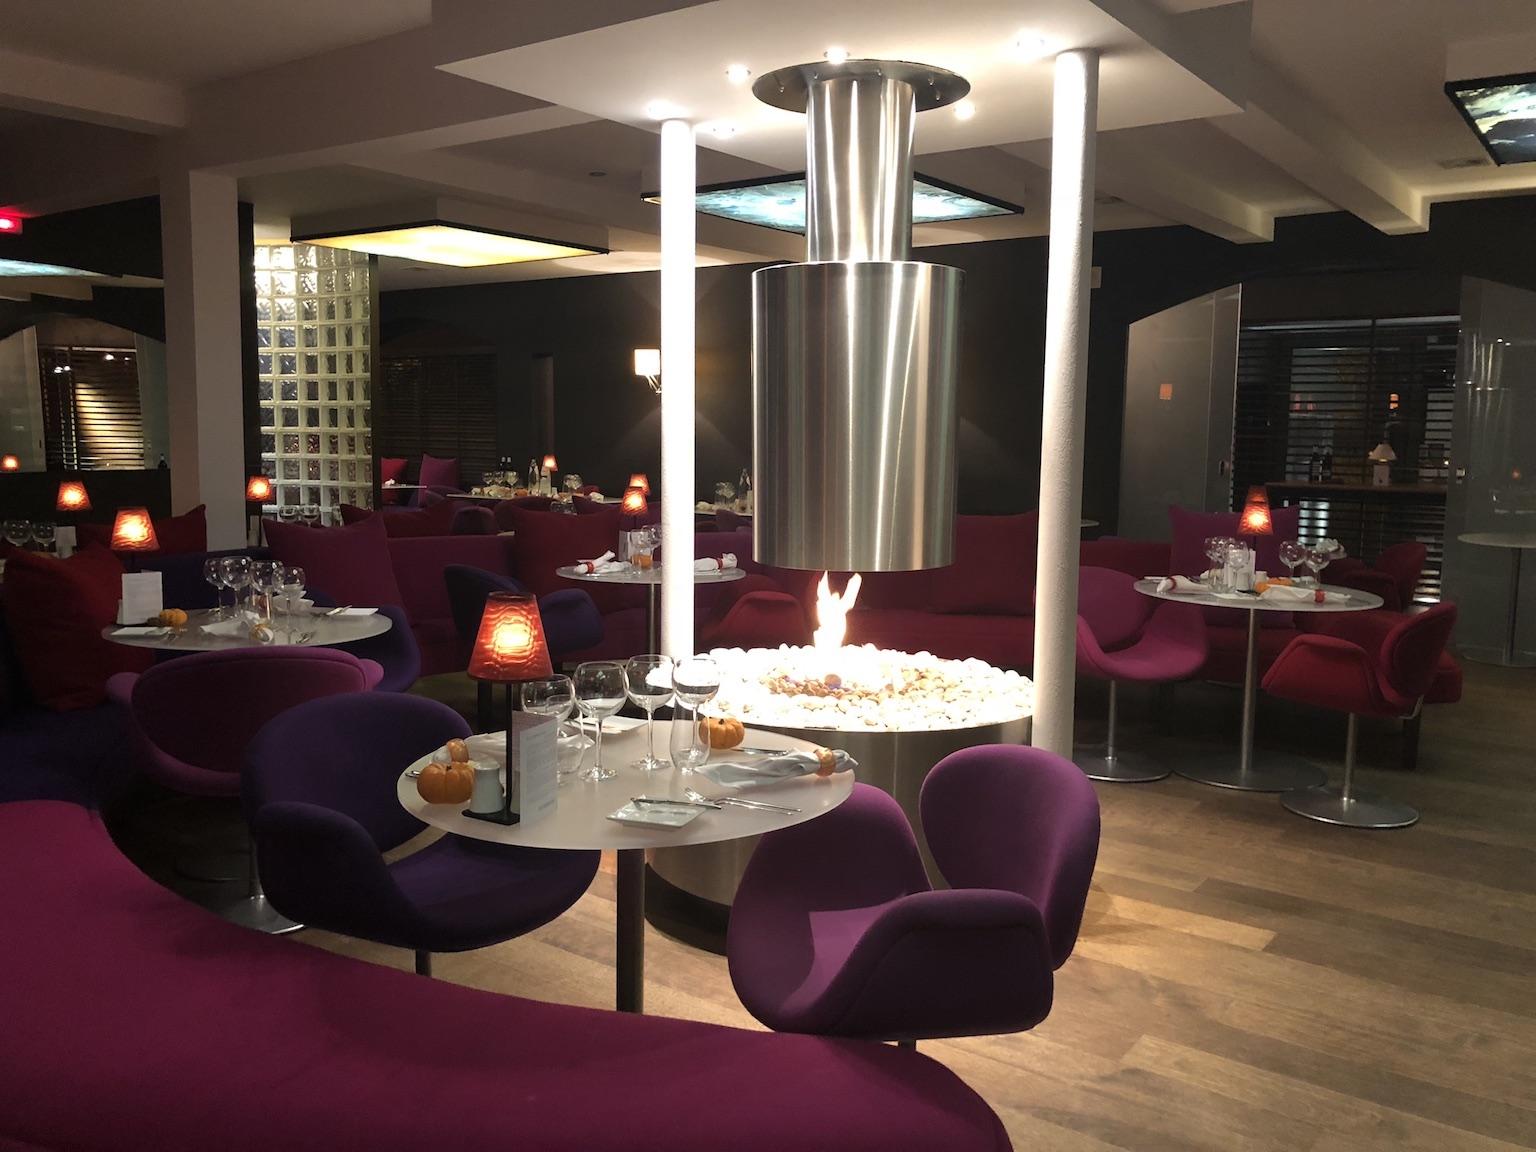 LoungEATude Louvain-la-Neuve : some places feel so good